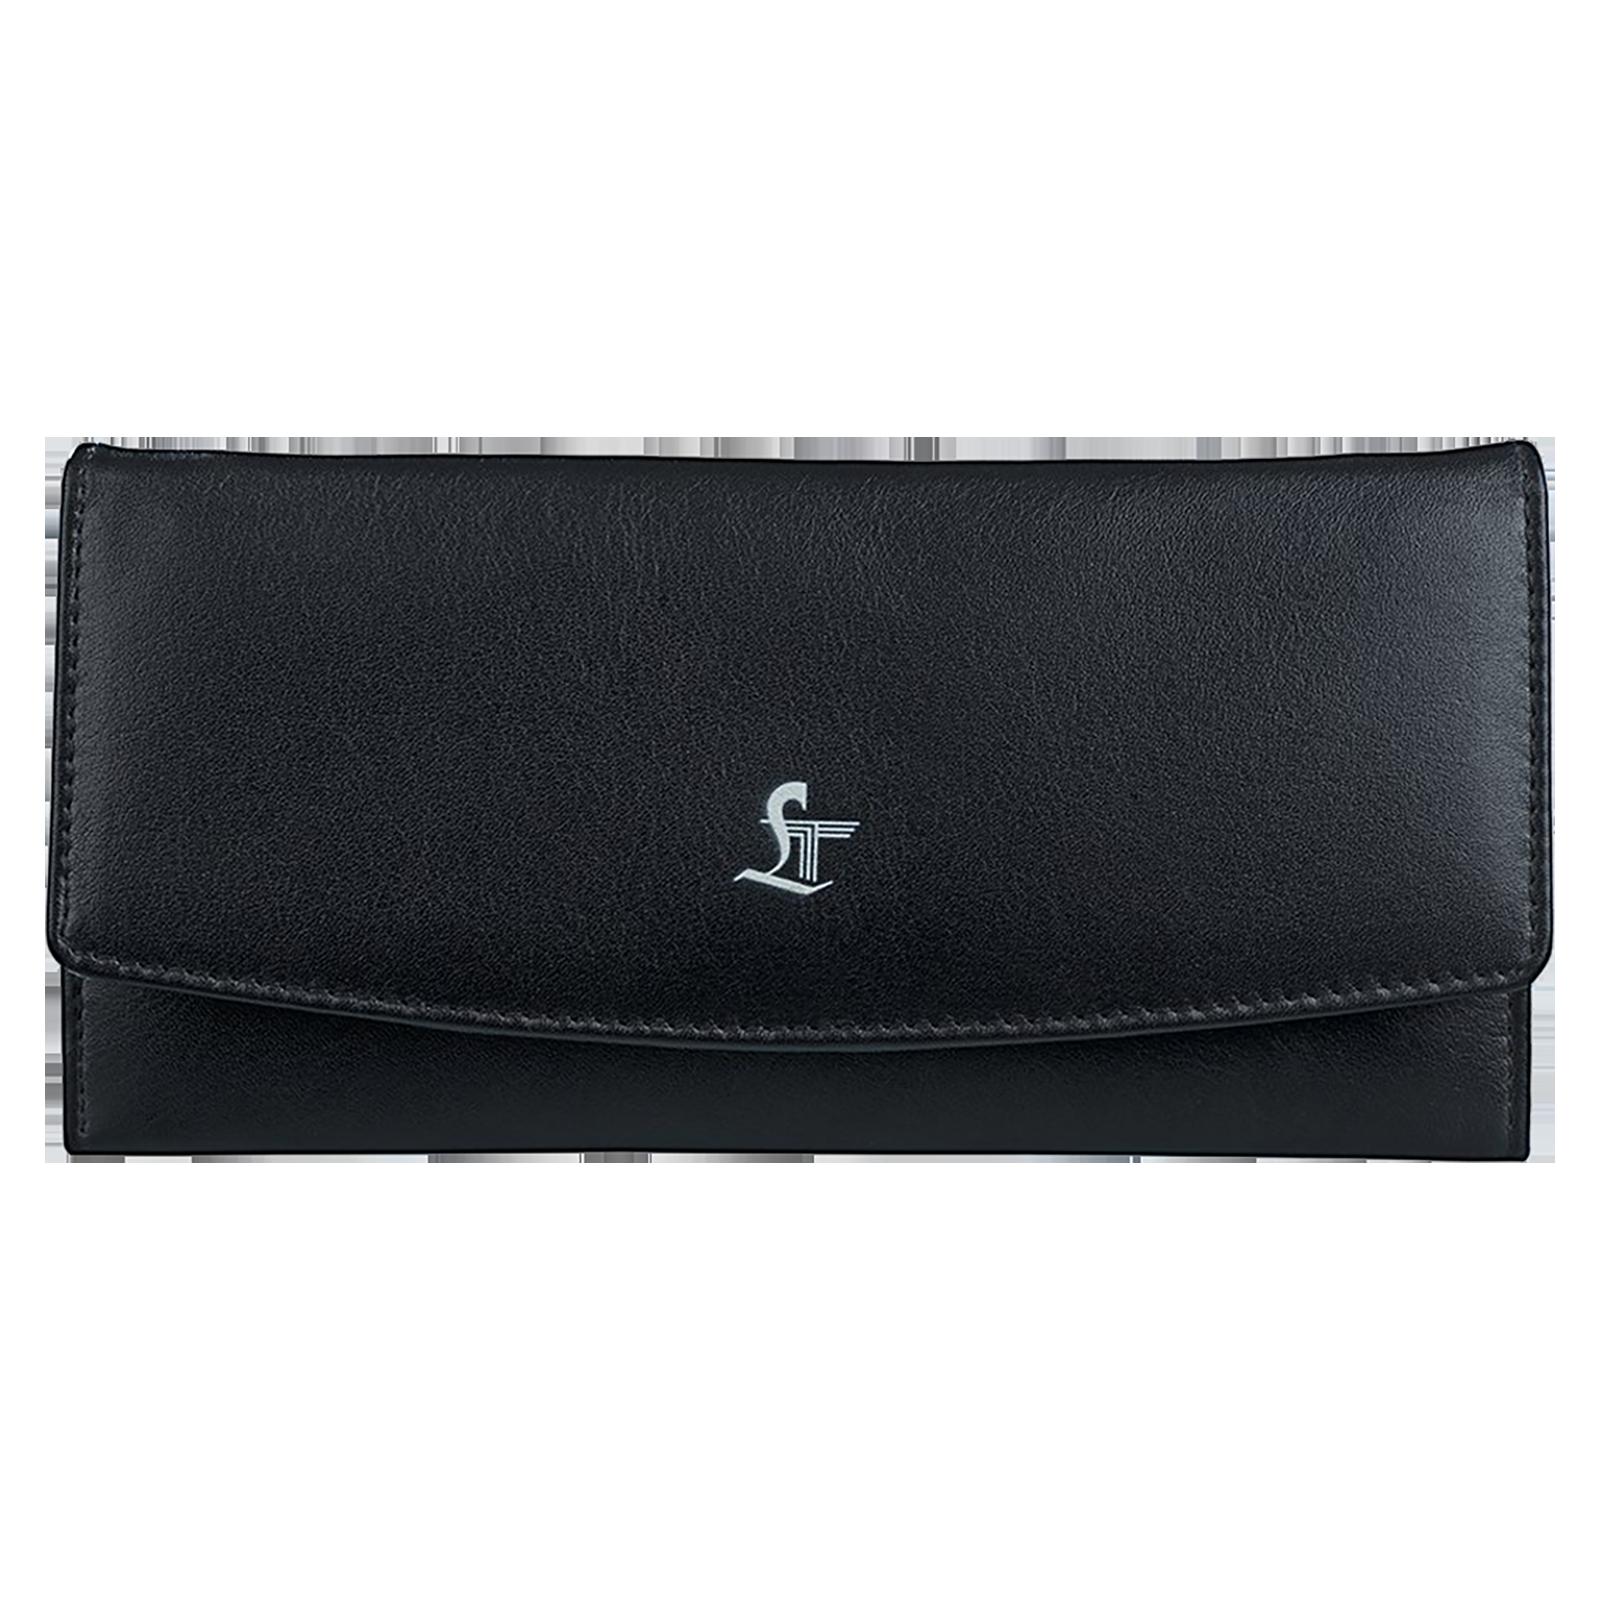 Leather Talks Ladies Smart Wallet (Built-in Tracker, LT/SR/006, Black)_1